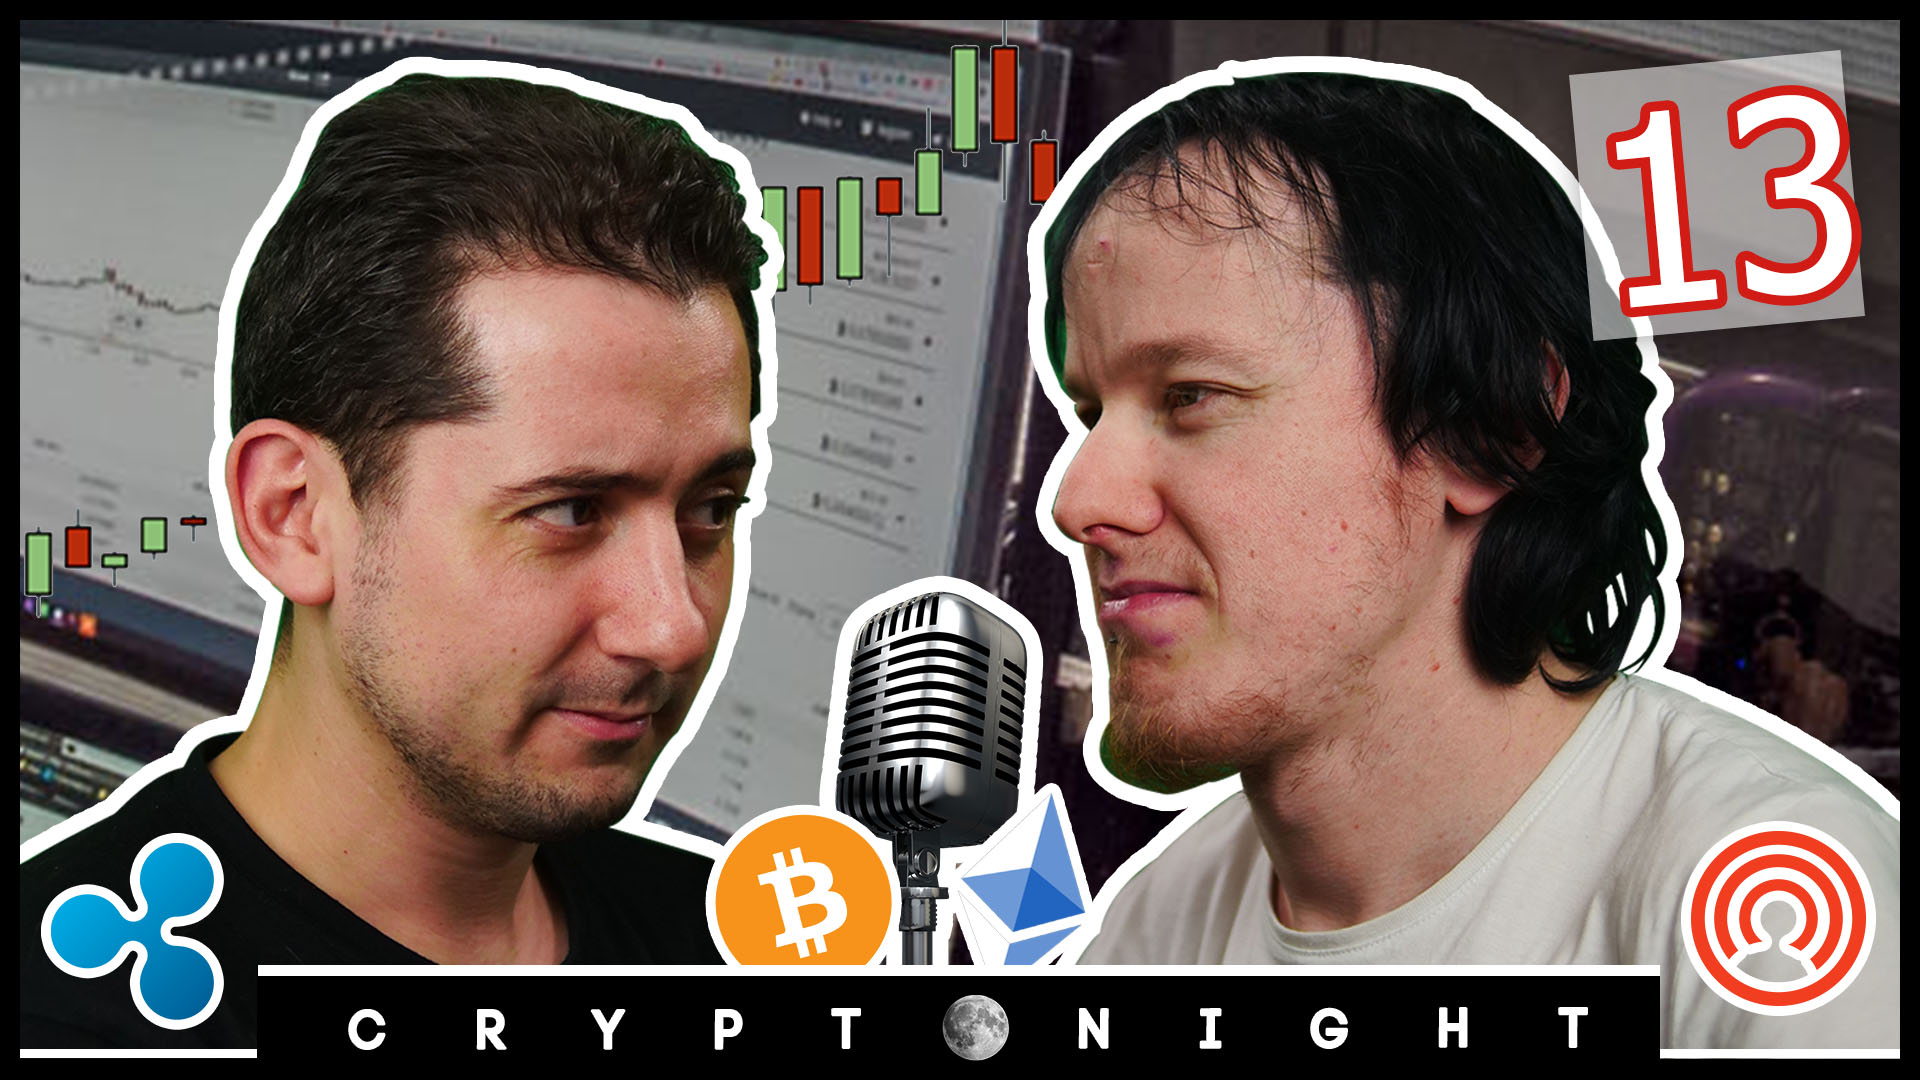 #Live12 et #Live13 CryptoLive avec Florent Kosmala et Crypto Trading France